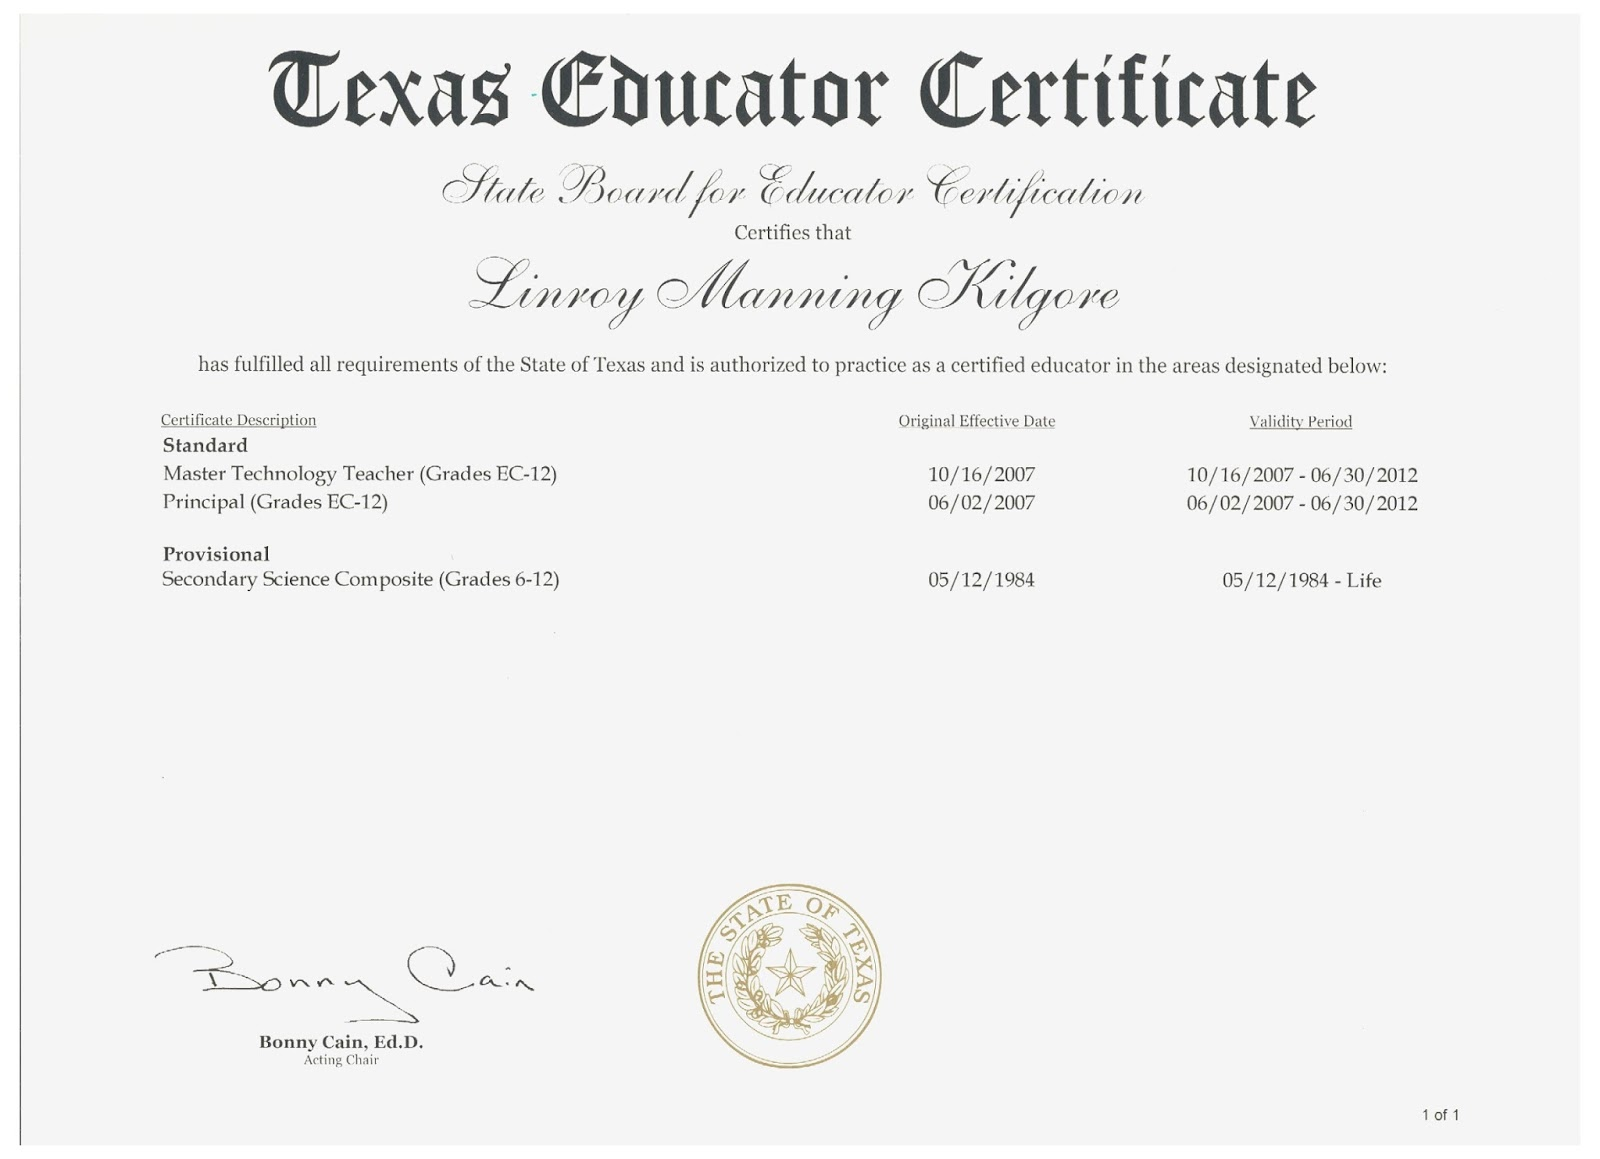 Examples Of Best Certificate: Texas Teacher Certification tr71